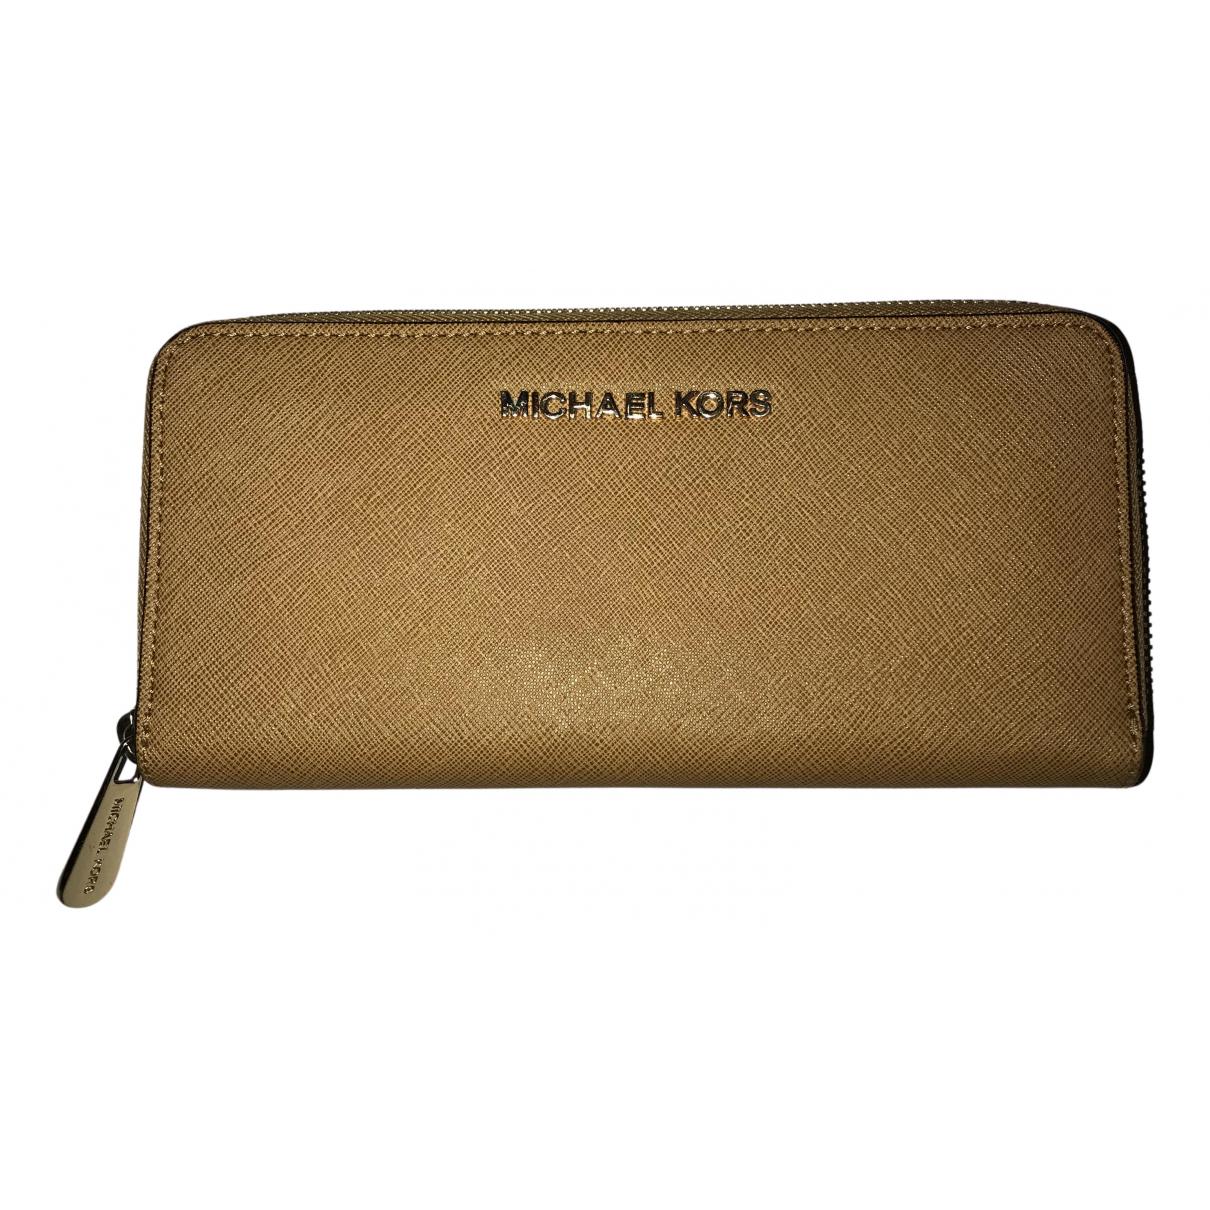 Michael Kors N Camel Leather wallet for Women N